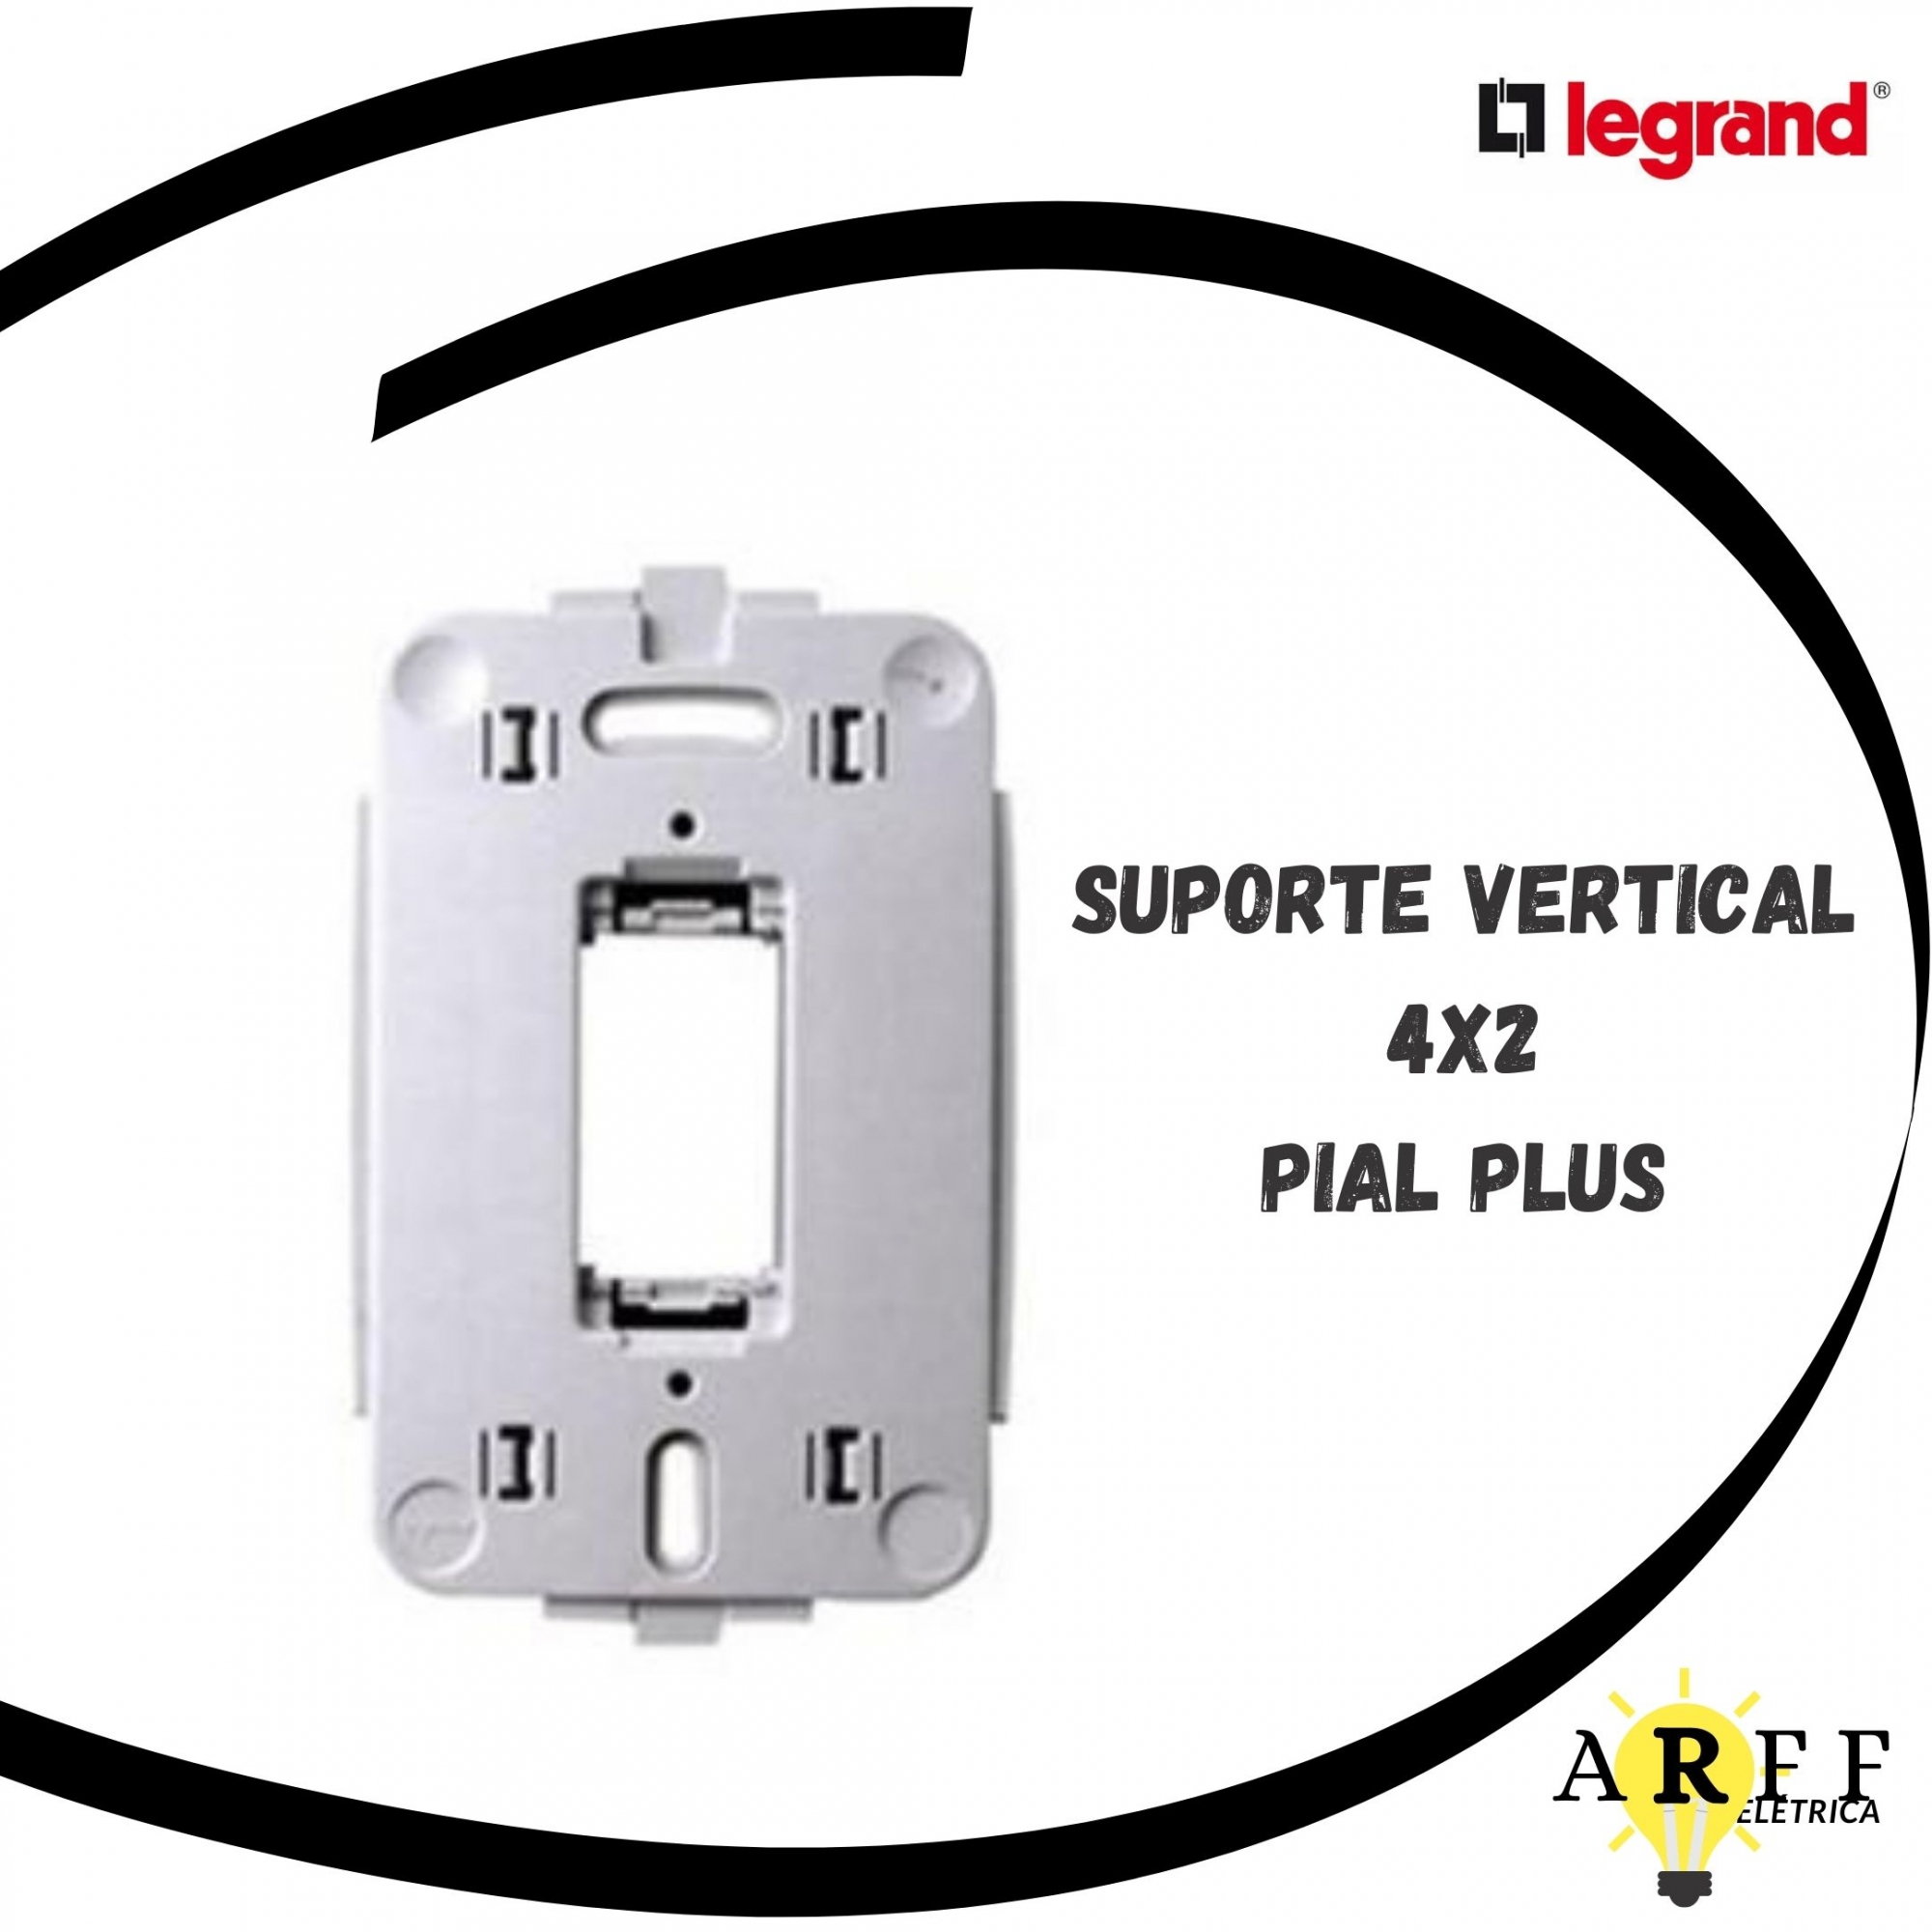 612121 Suporte para caixa 4x2 modulo vertical PIAL PLUS LEGRAND